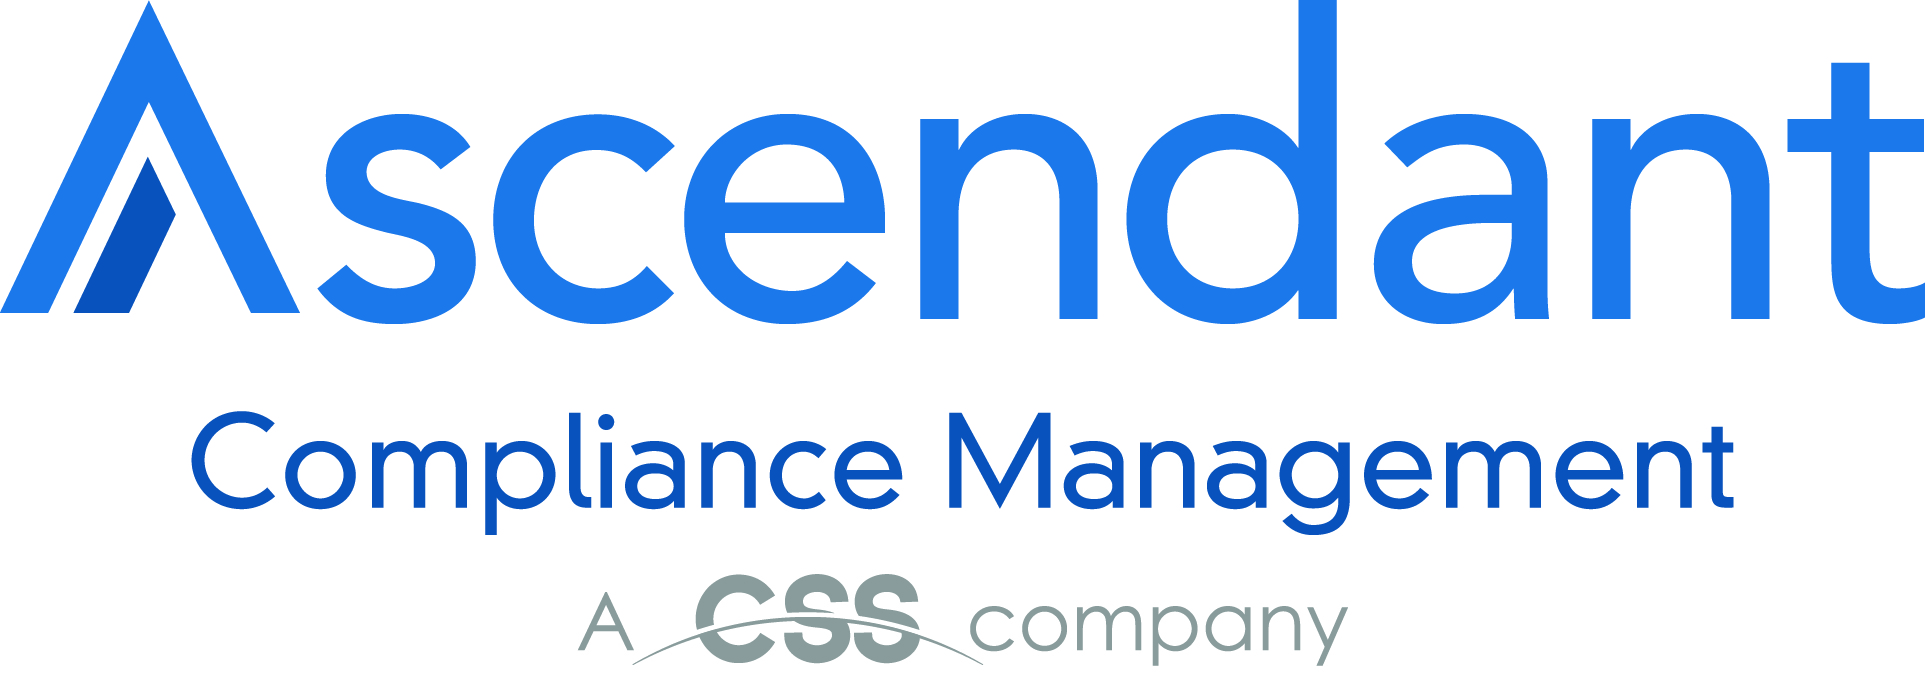 CSS-SubBrand_Ascendant